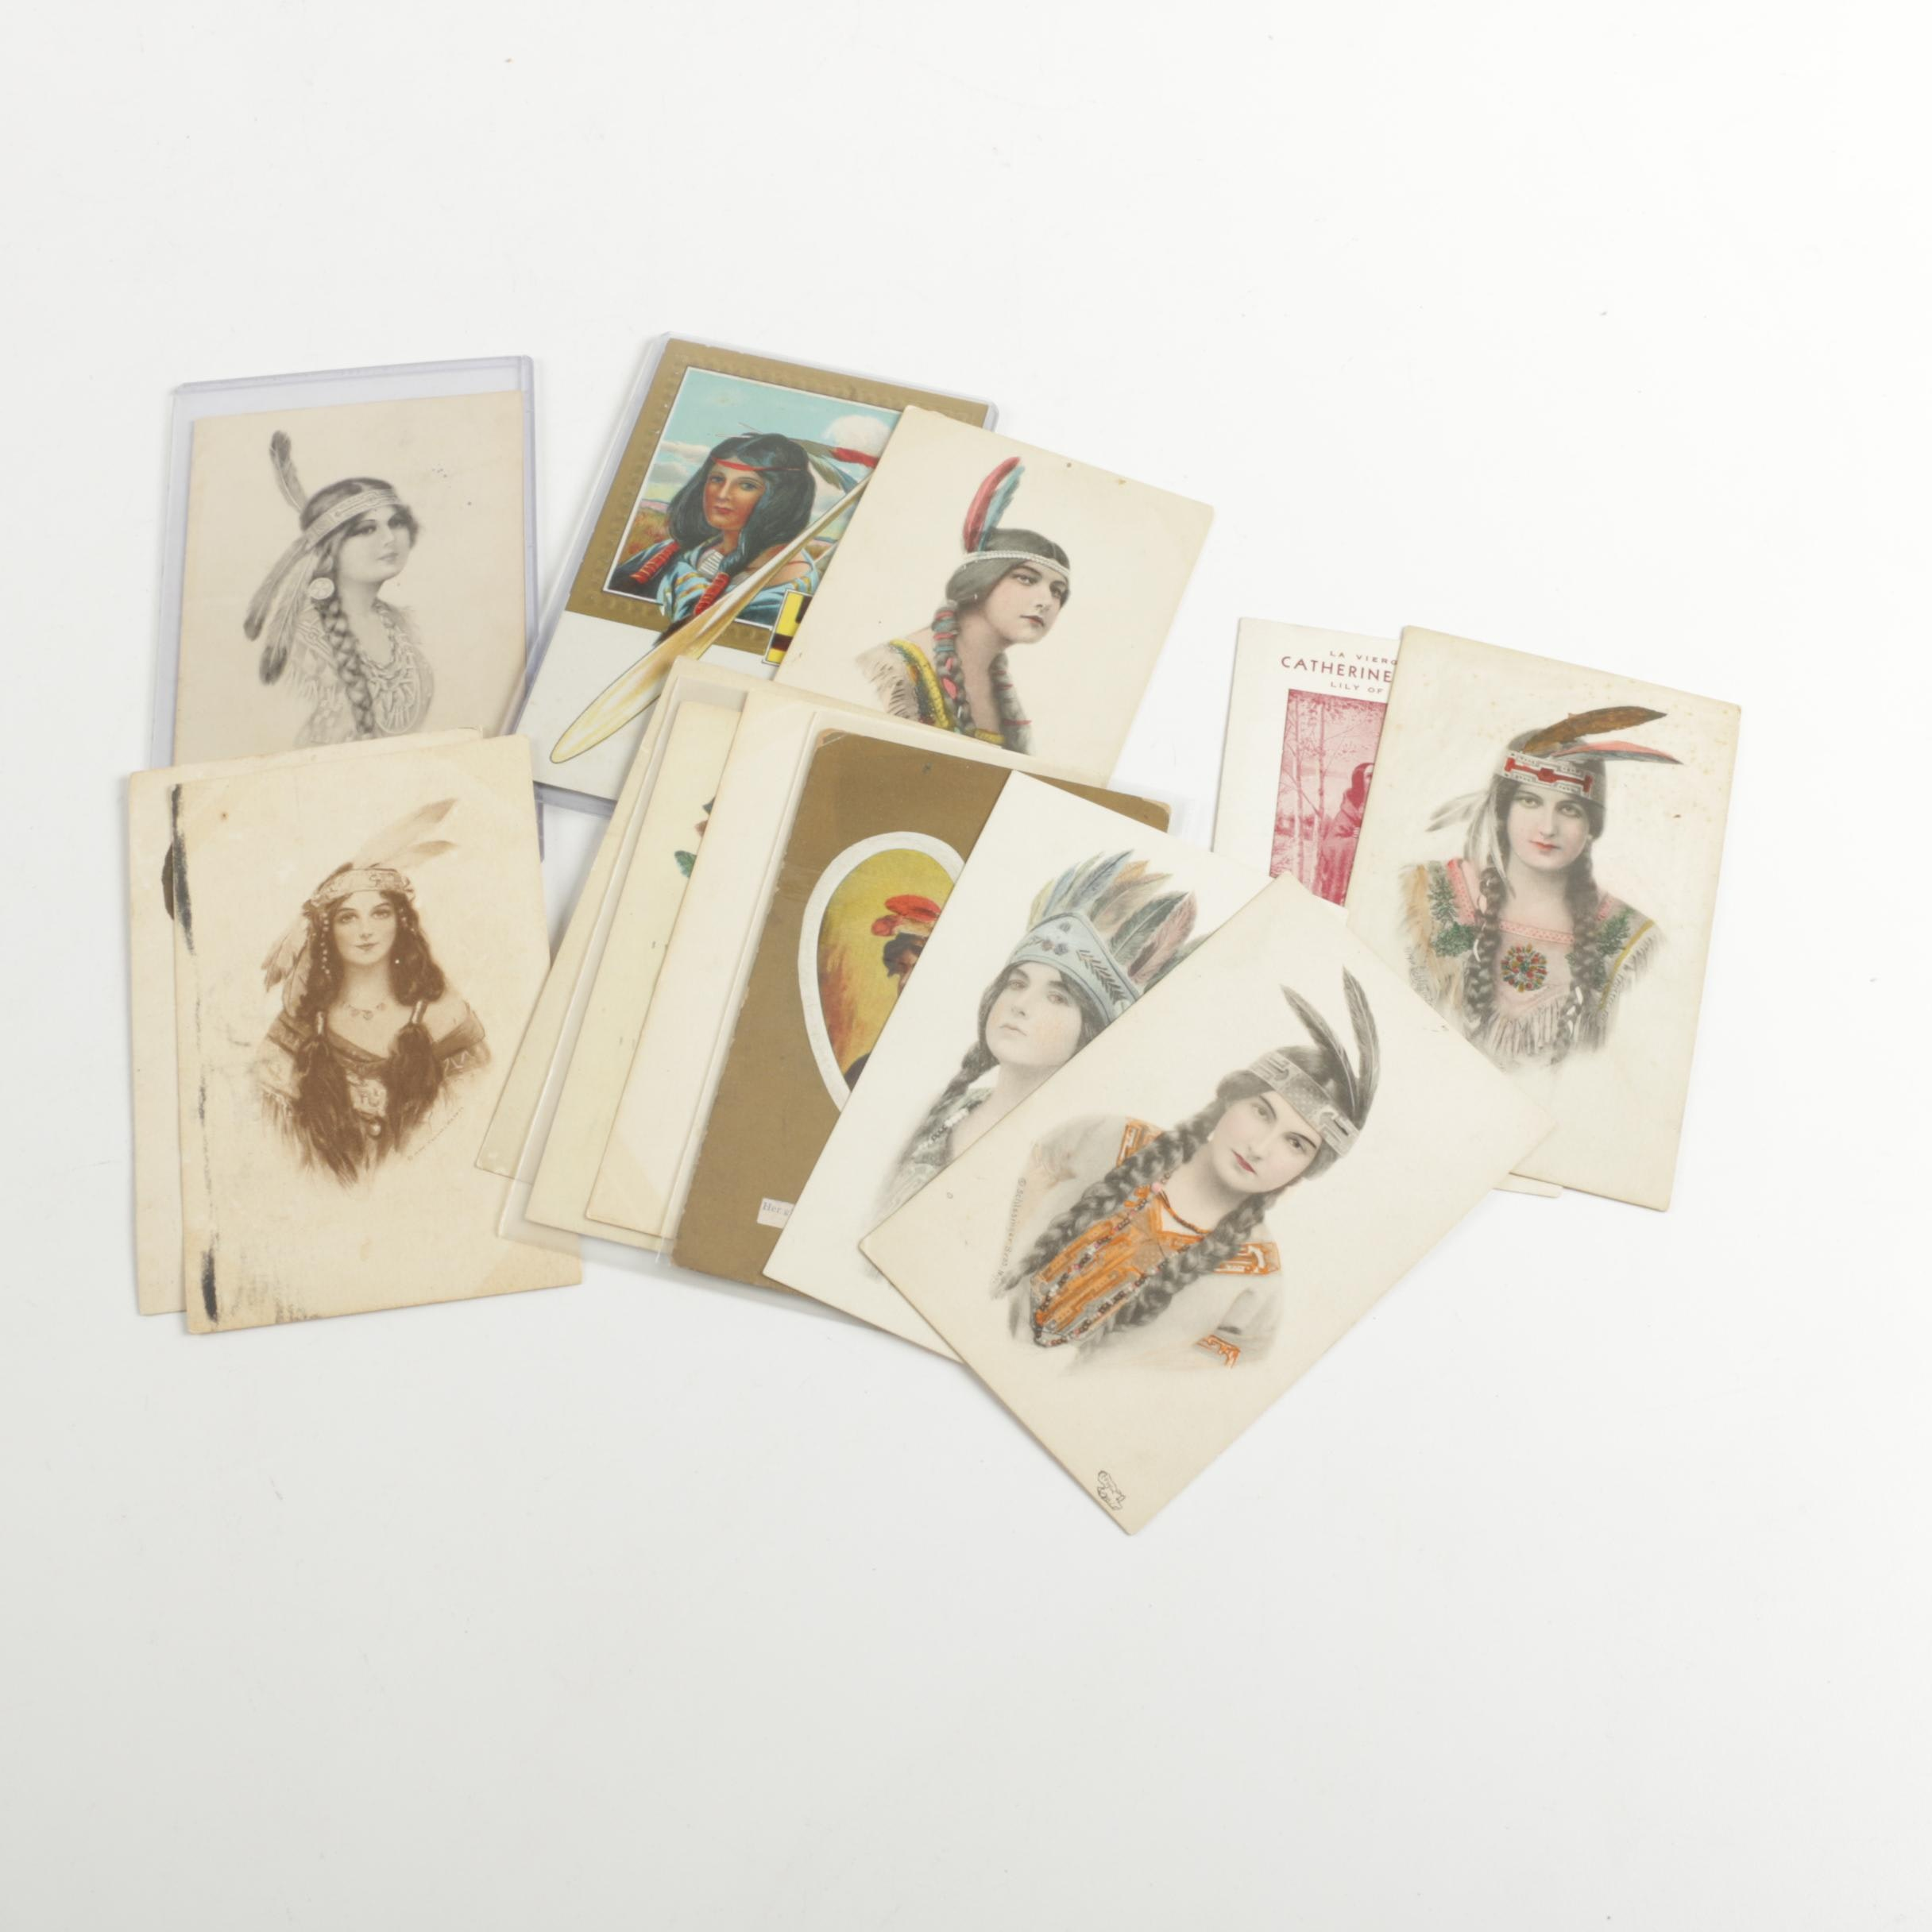 Circa 20th Century Native American Themed Postcards